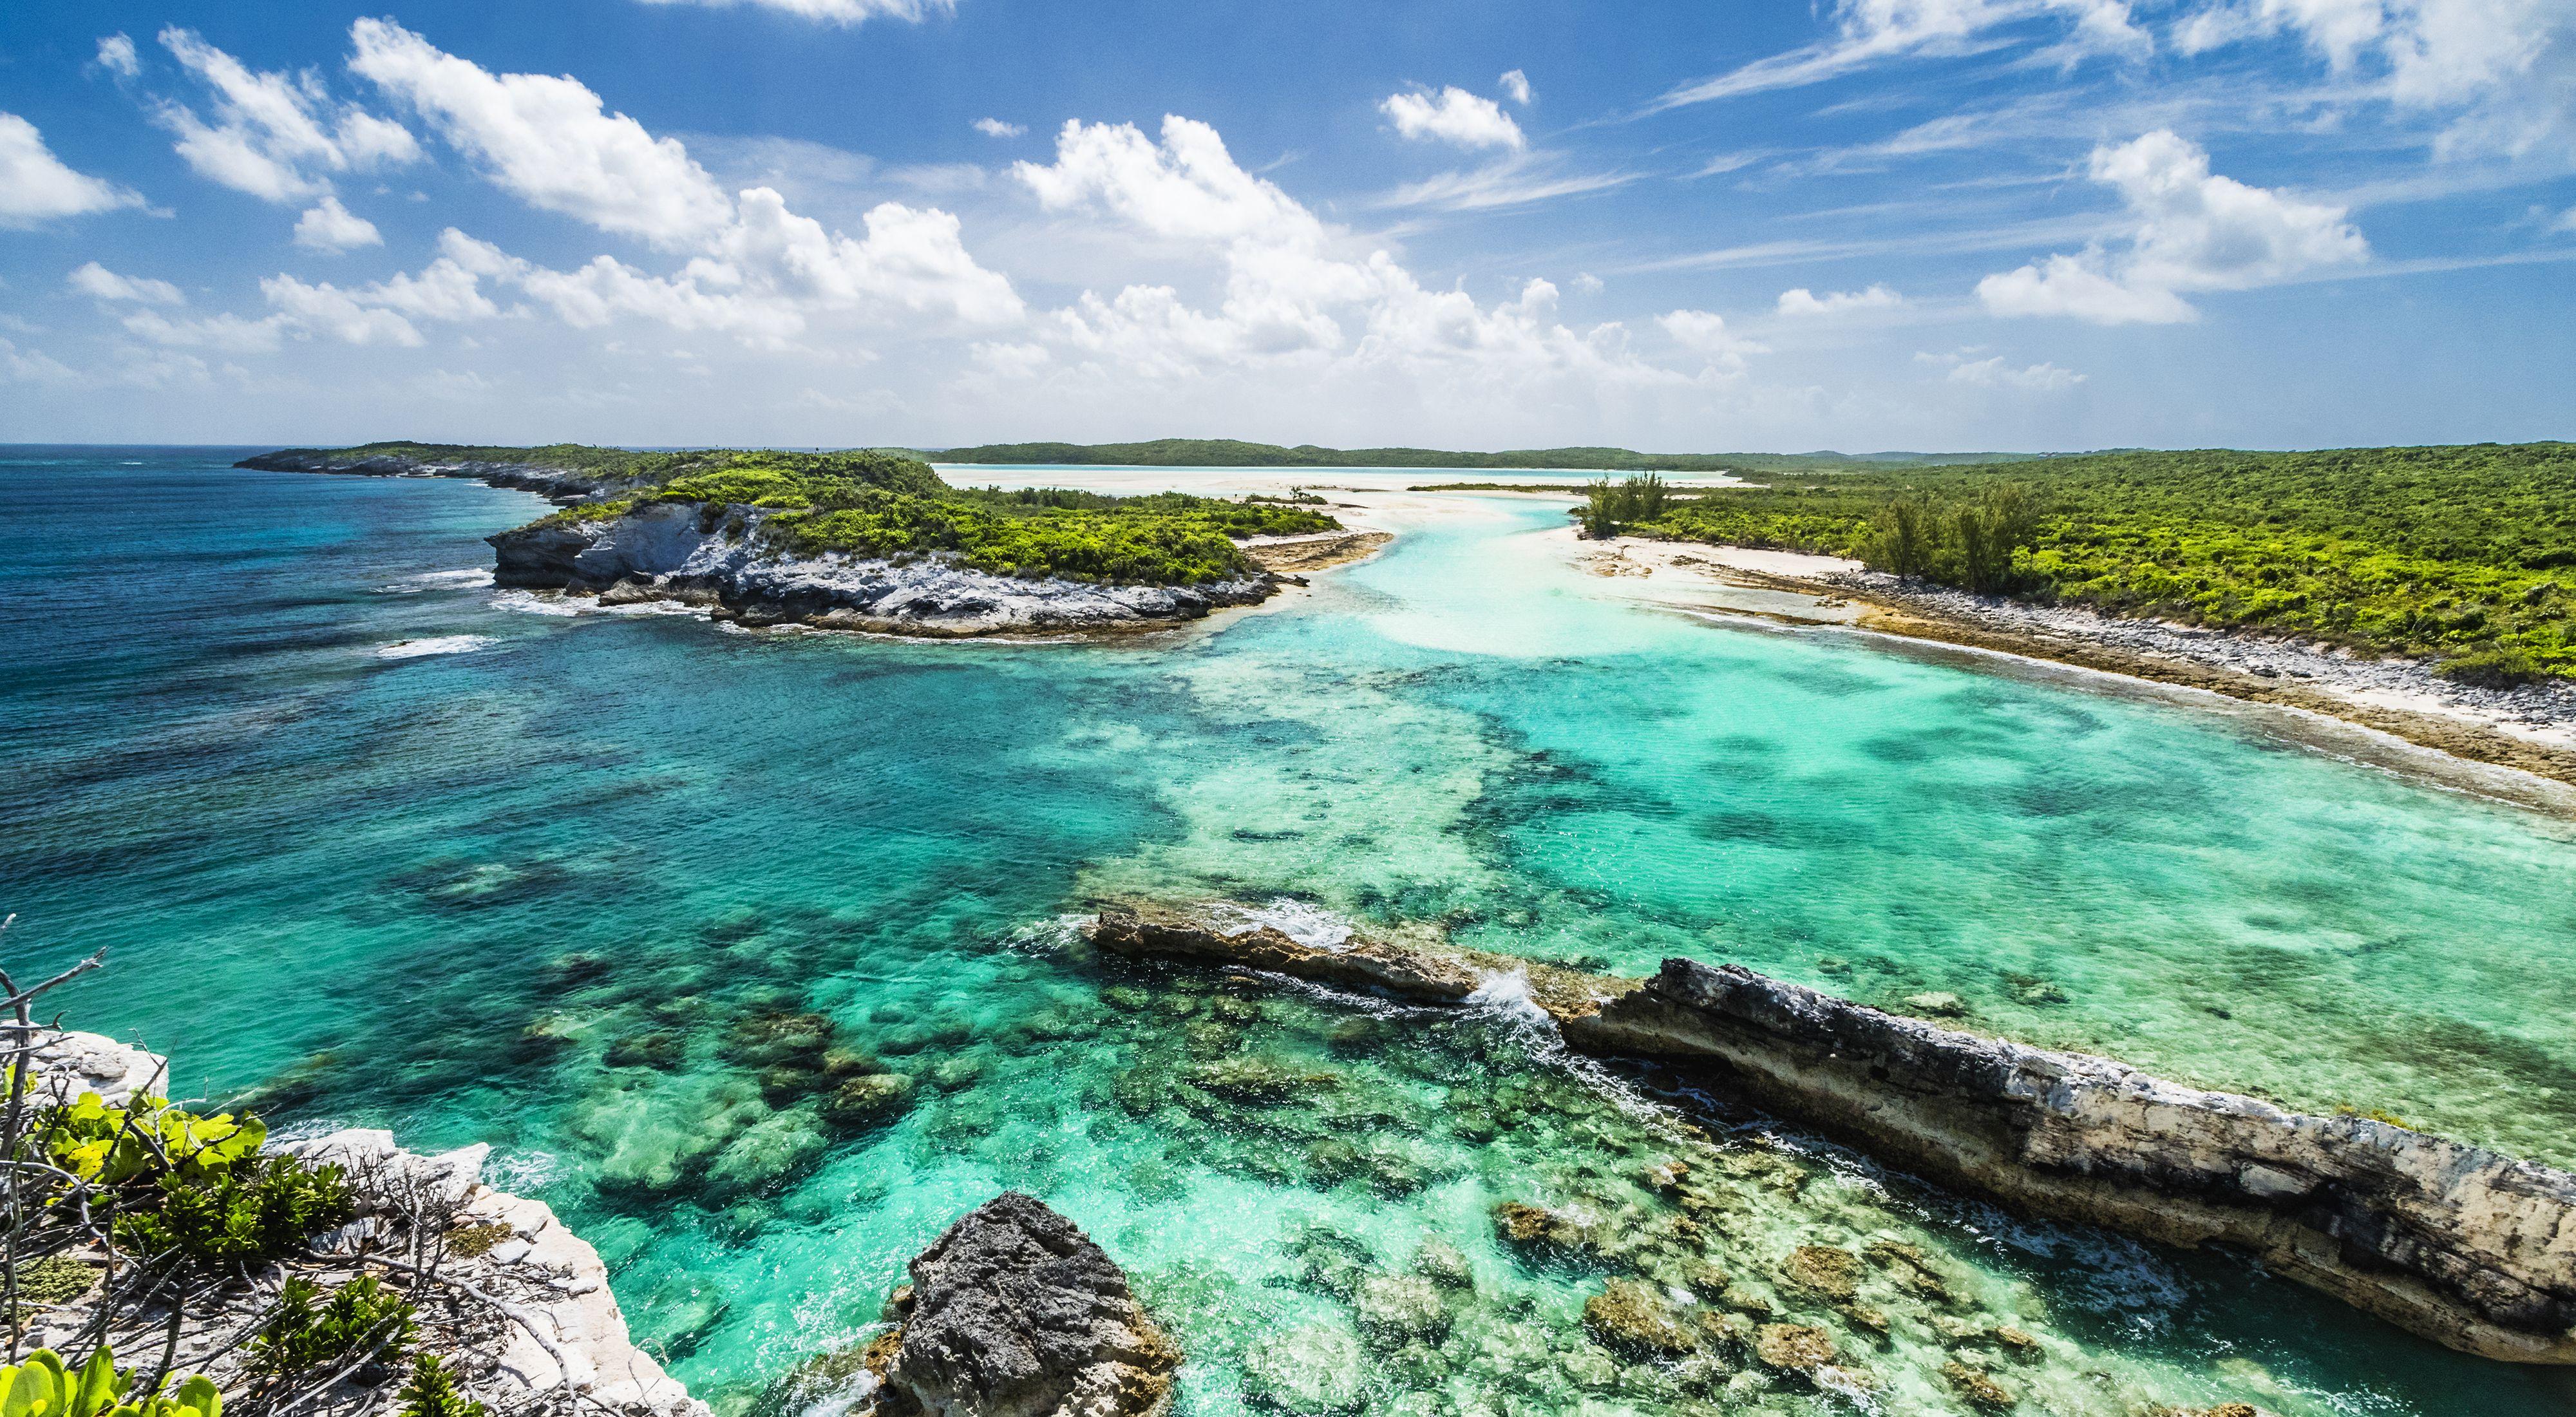 LongIsland-Bahamas-ShaneGross.jpg